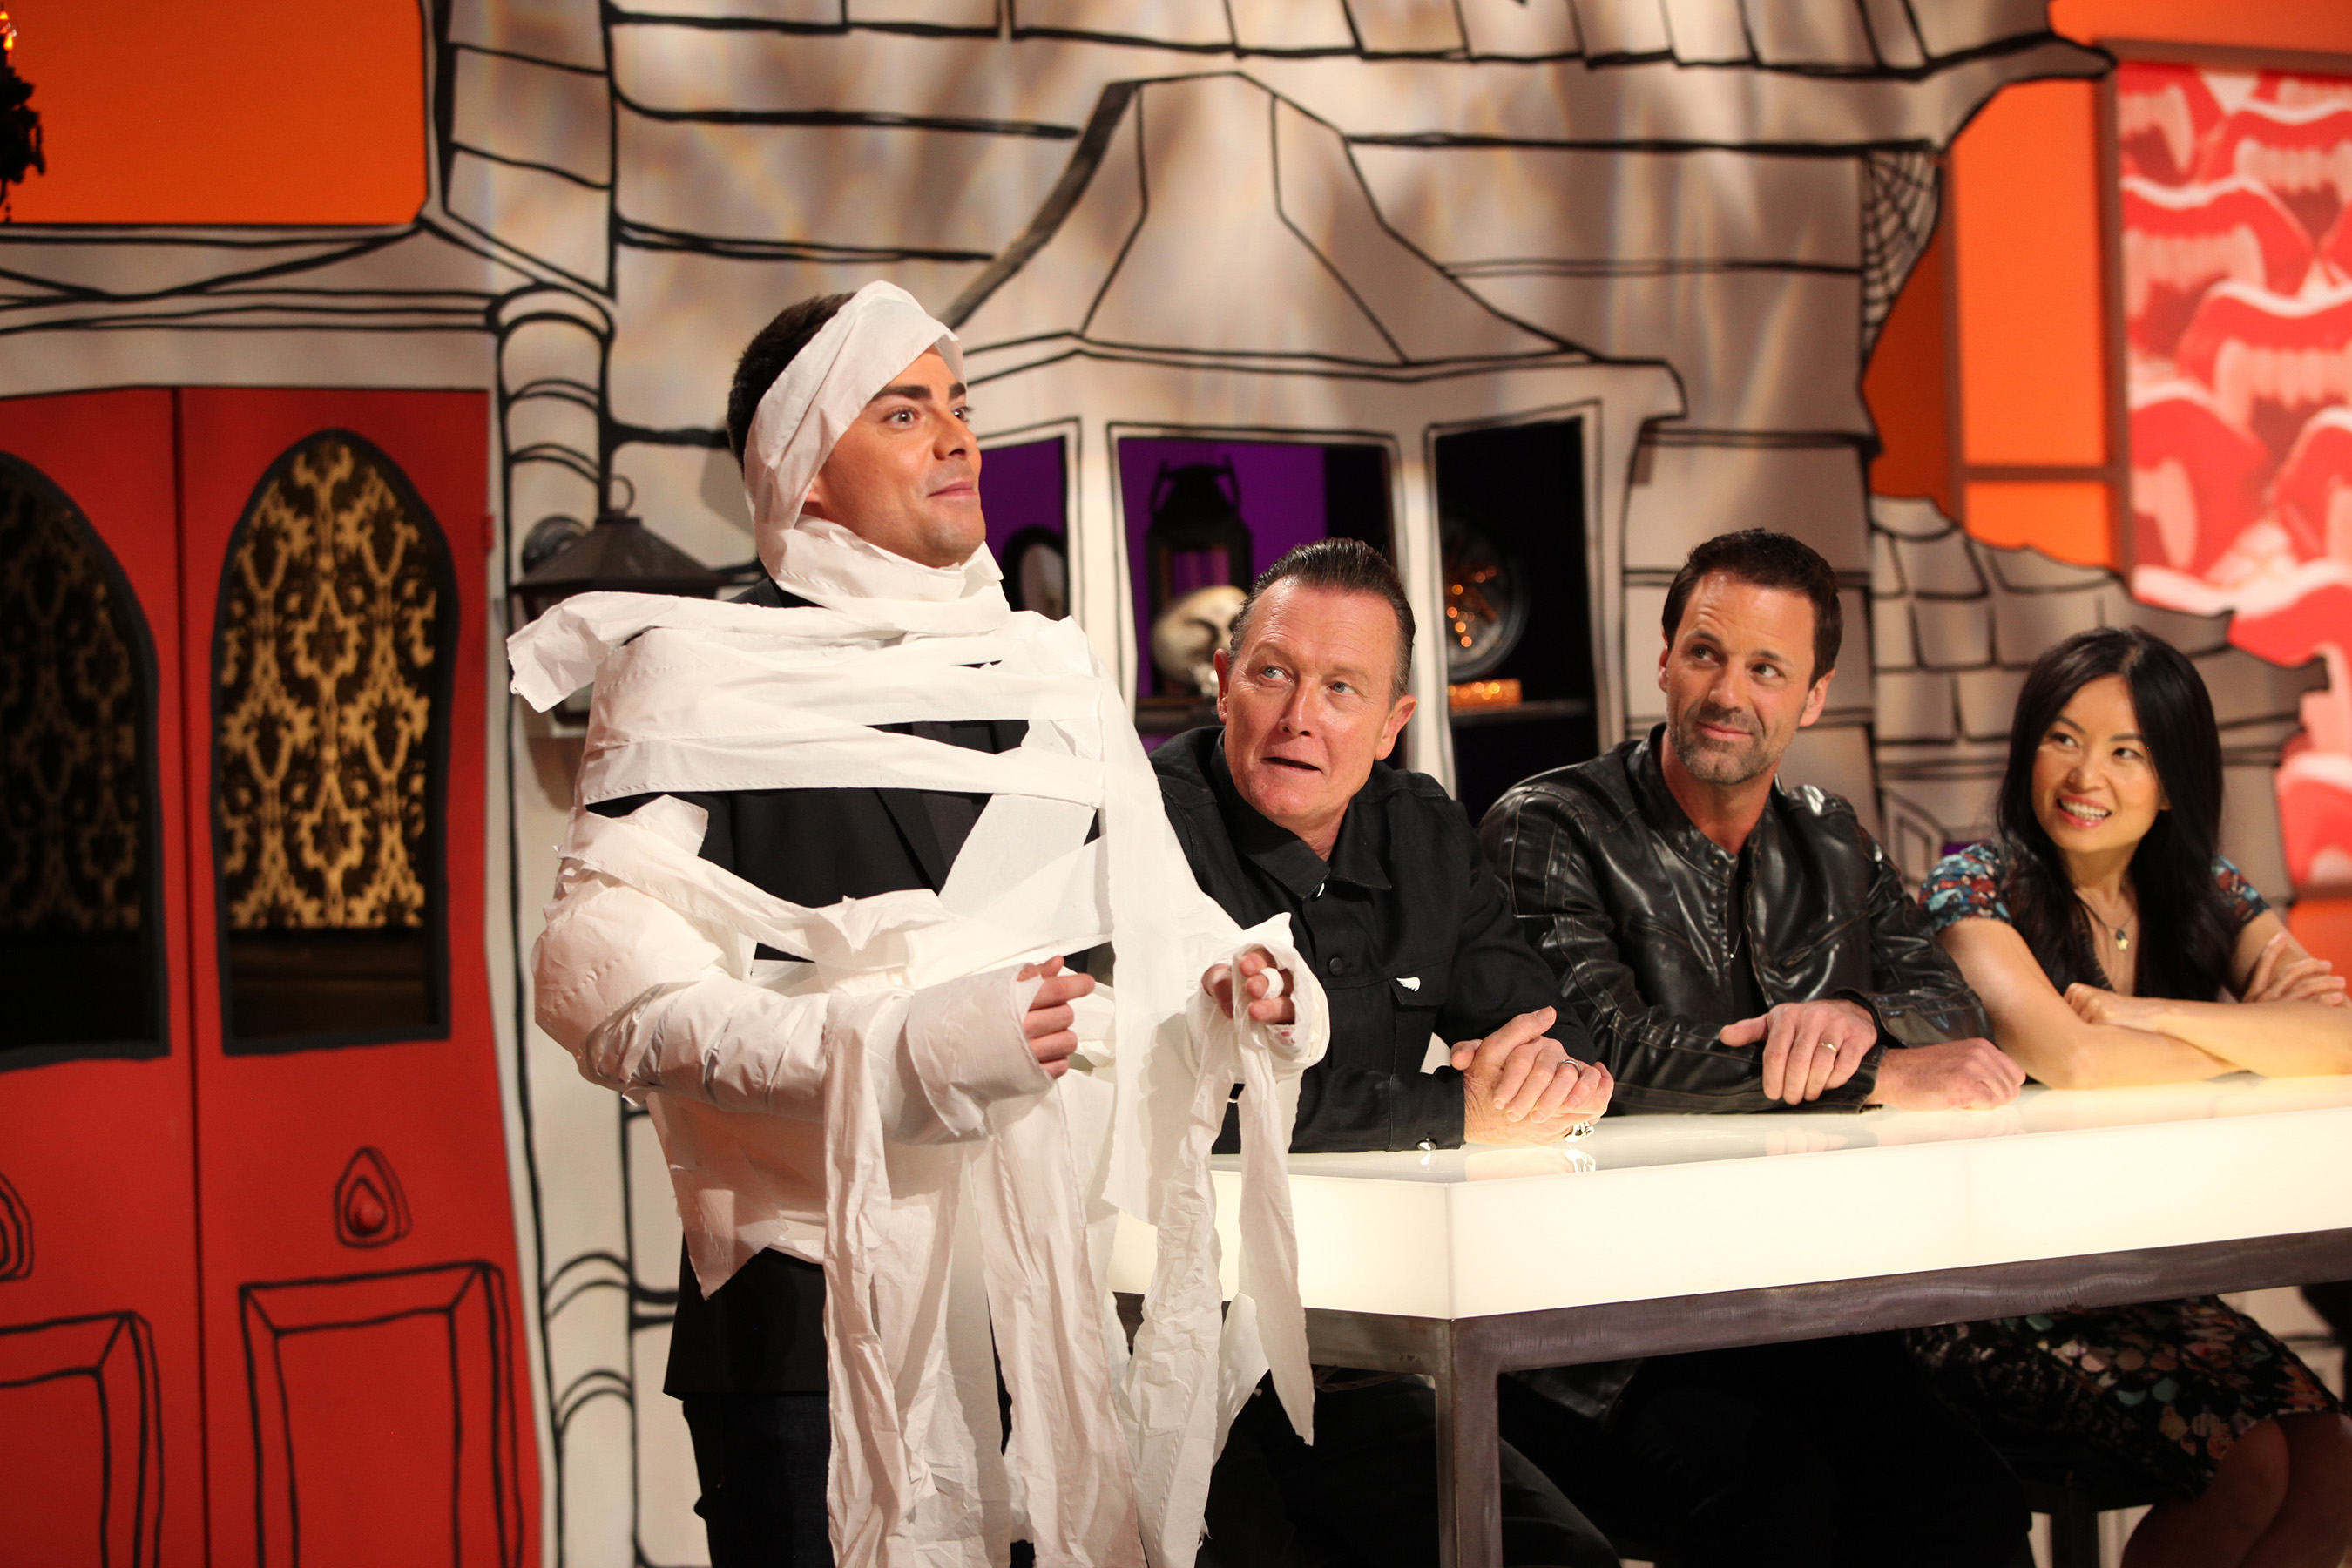 Host Jonathan Bennett with guest judge Robert Patrick and judges Todd Tucker and Shinmin Li on Food Network's 'Halloween Wars'.